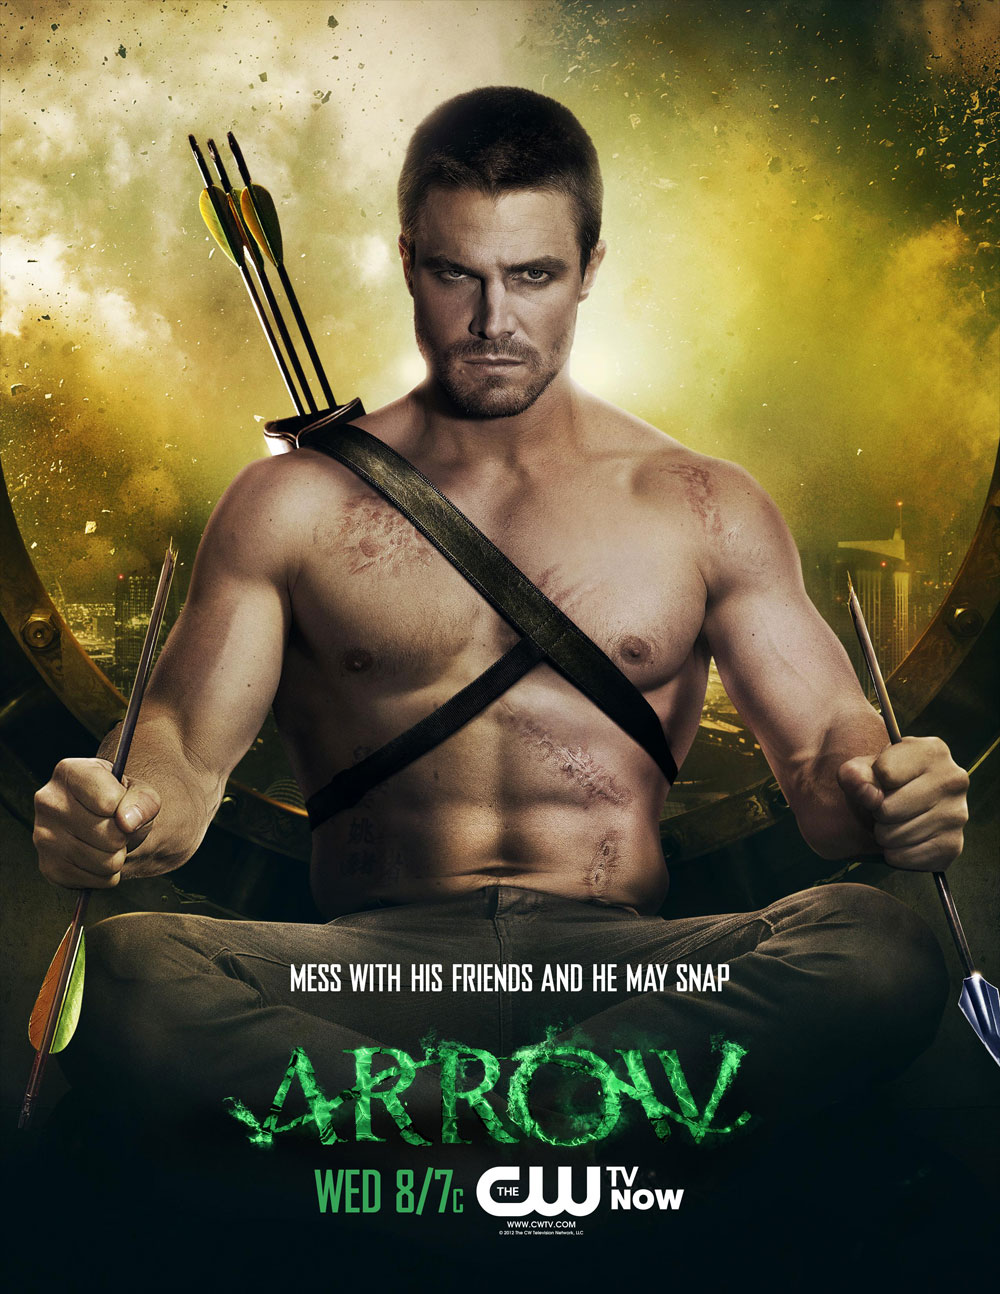 xem phim Mũi Tên Xanh 2 - Arrow Season 2 2013 full hd vietsub online poster